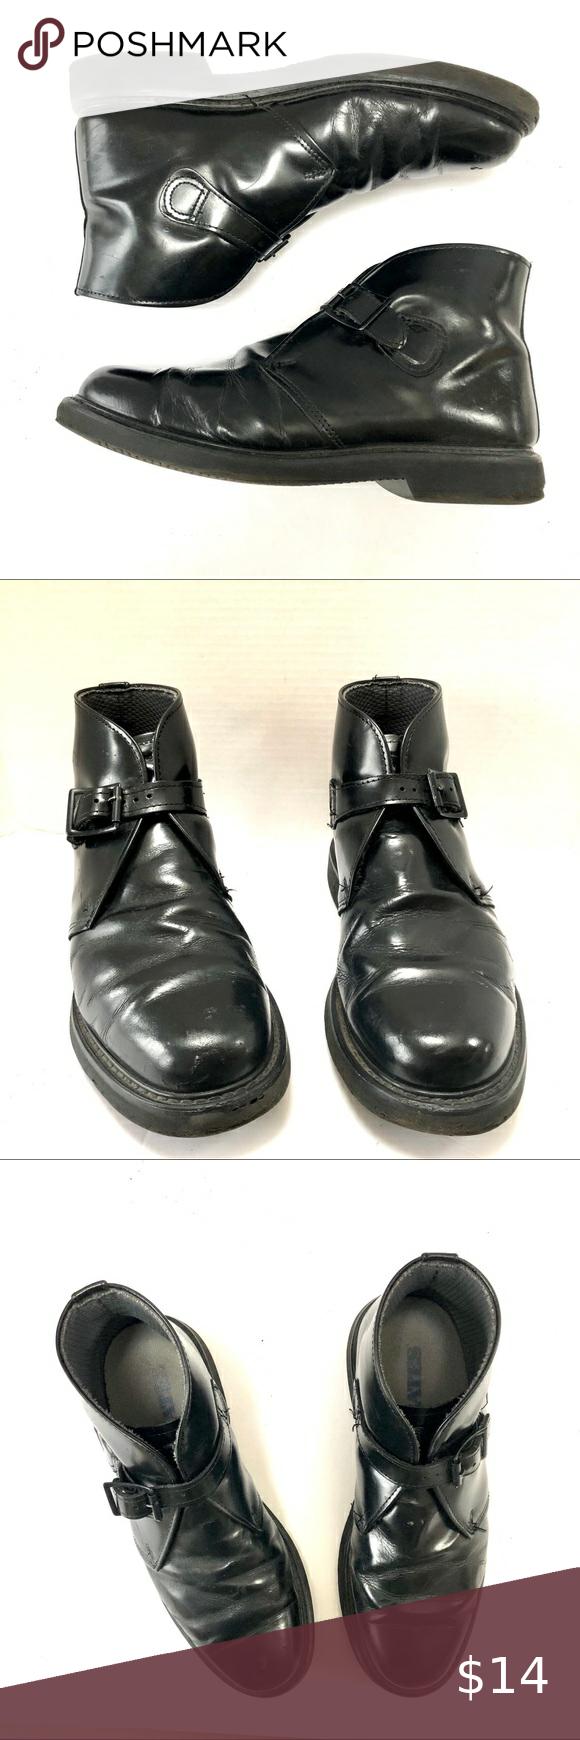 bates lites black boots